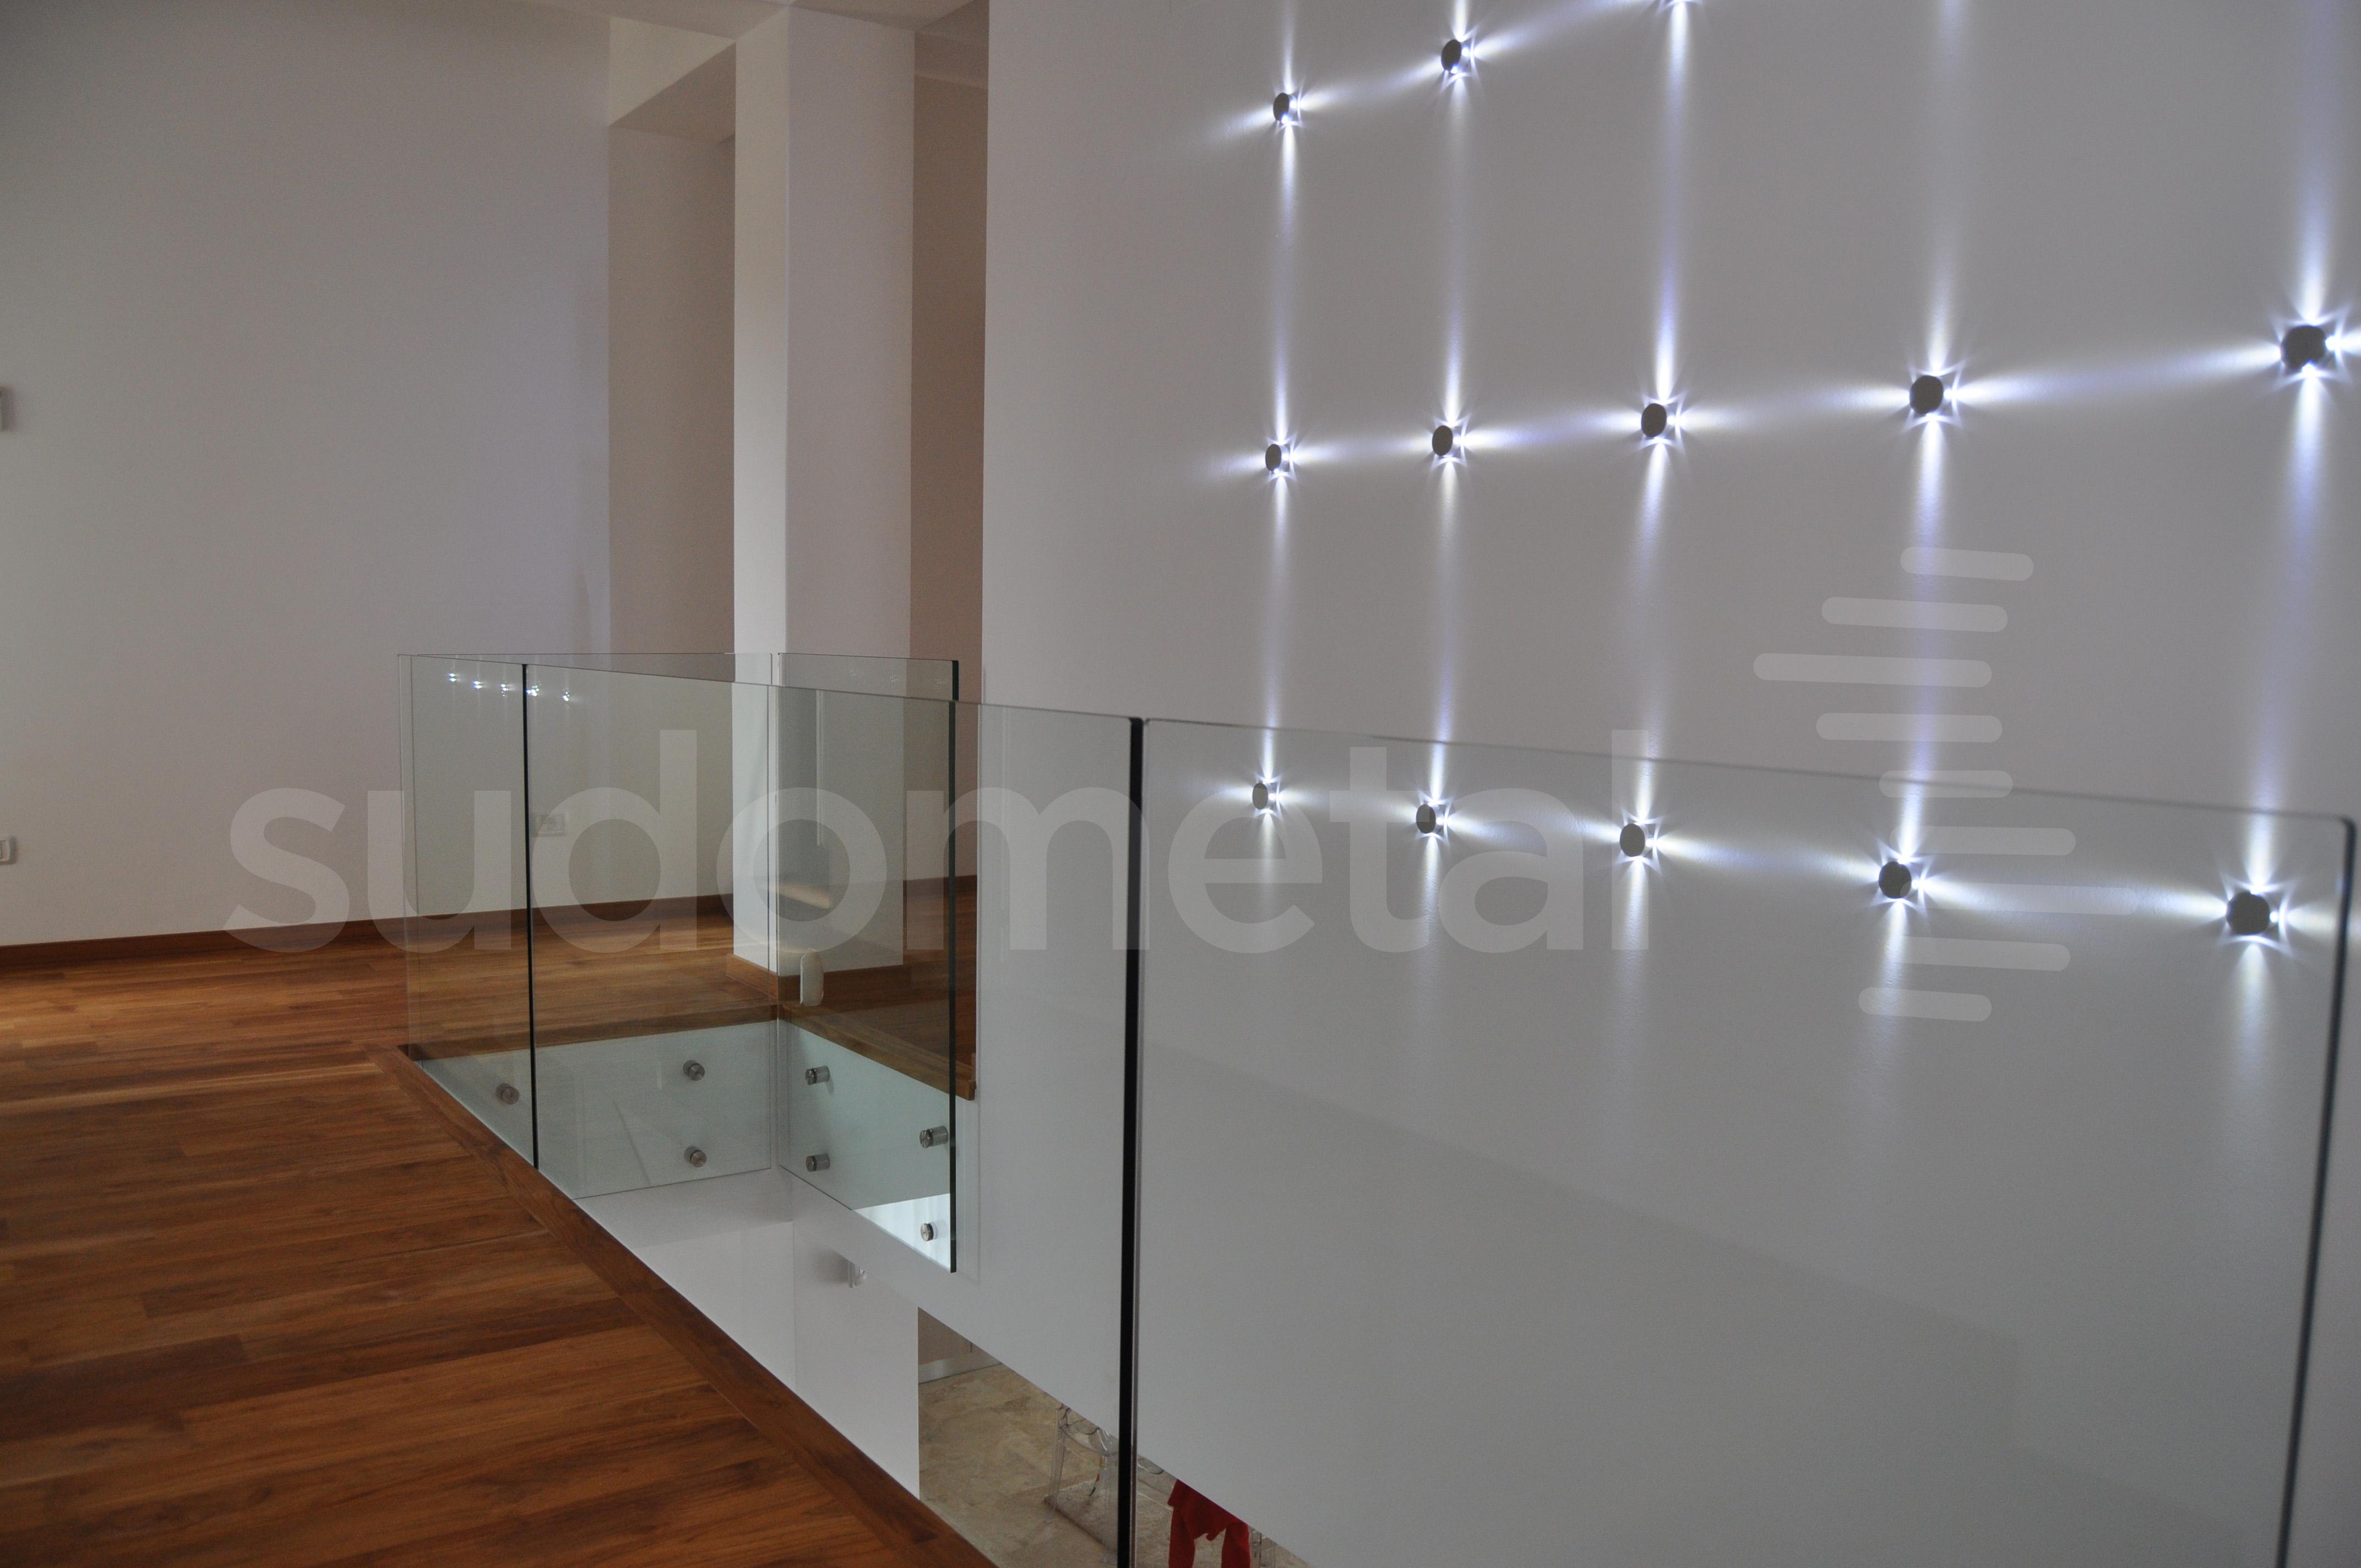 Balustrade din sticla - Balustrada casa particulara Corbeanca SUDOMETAL - Poza 4